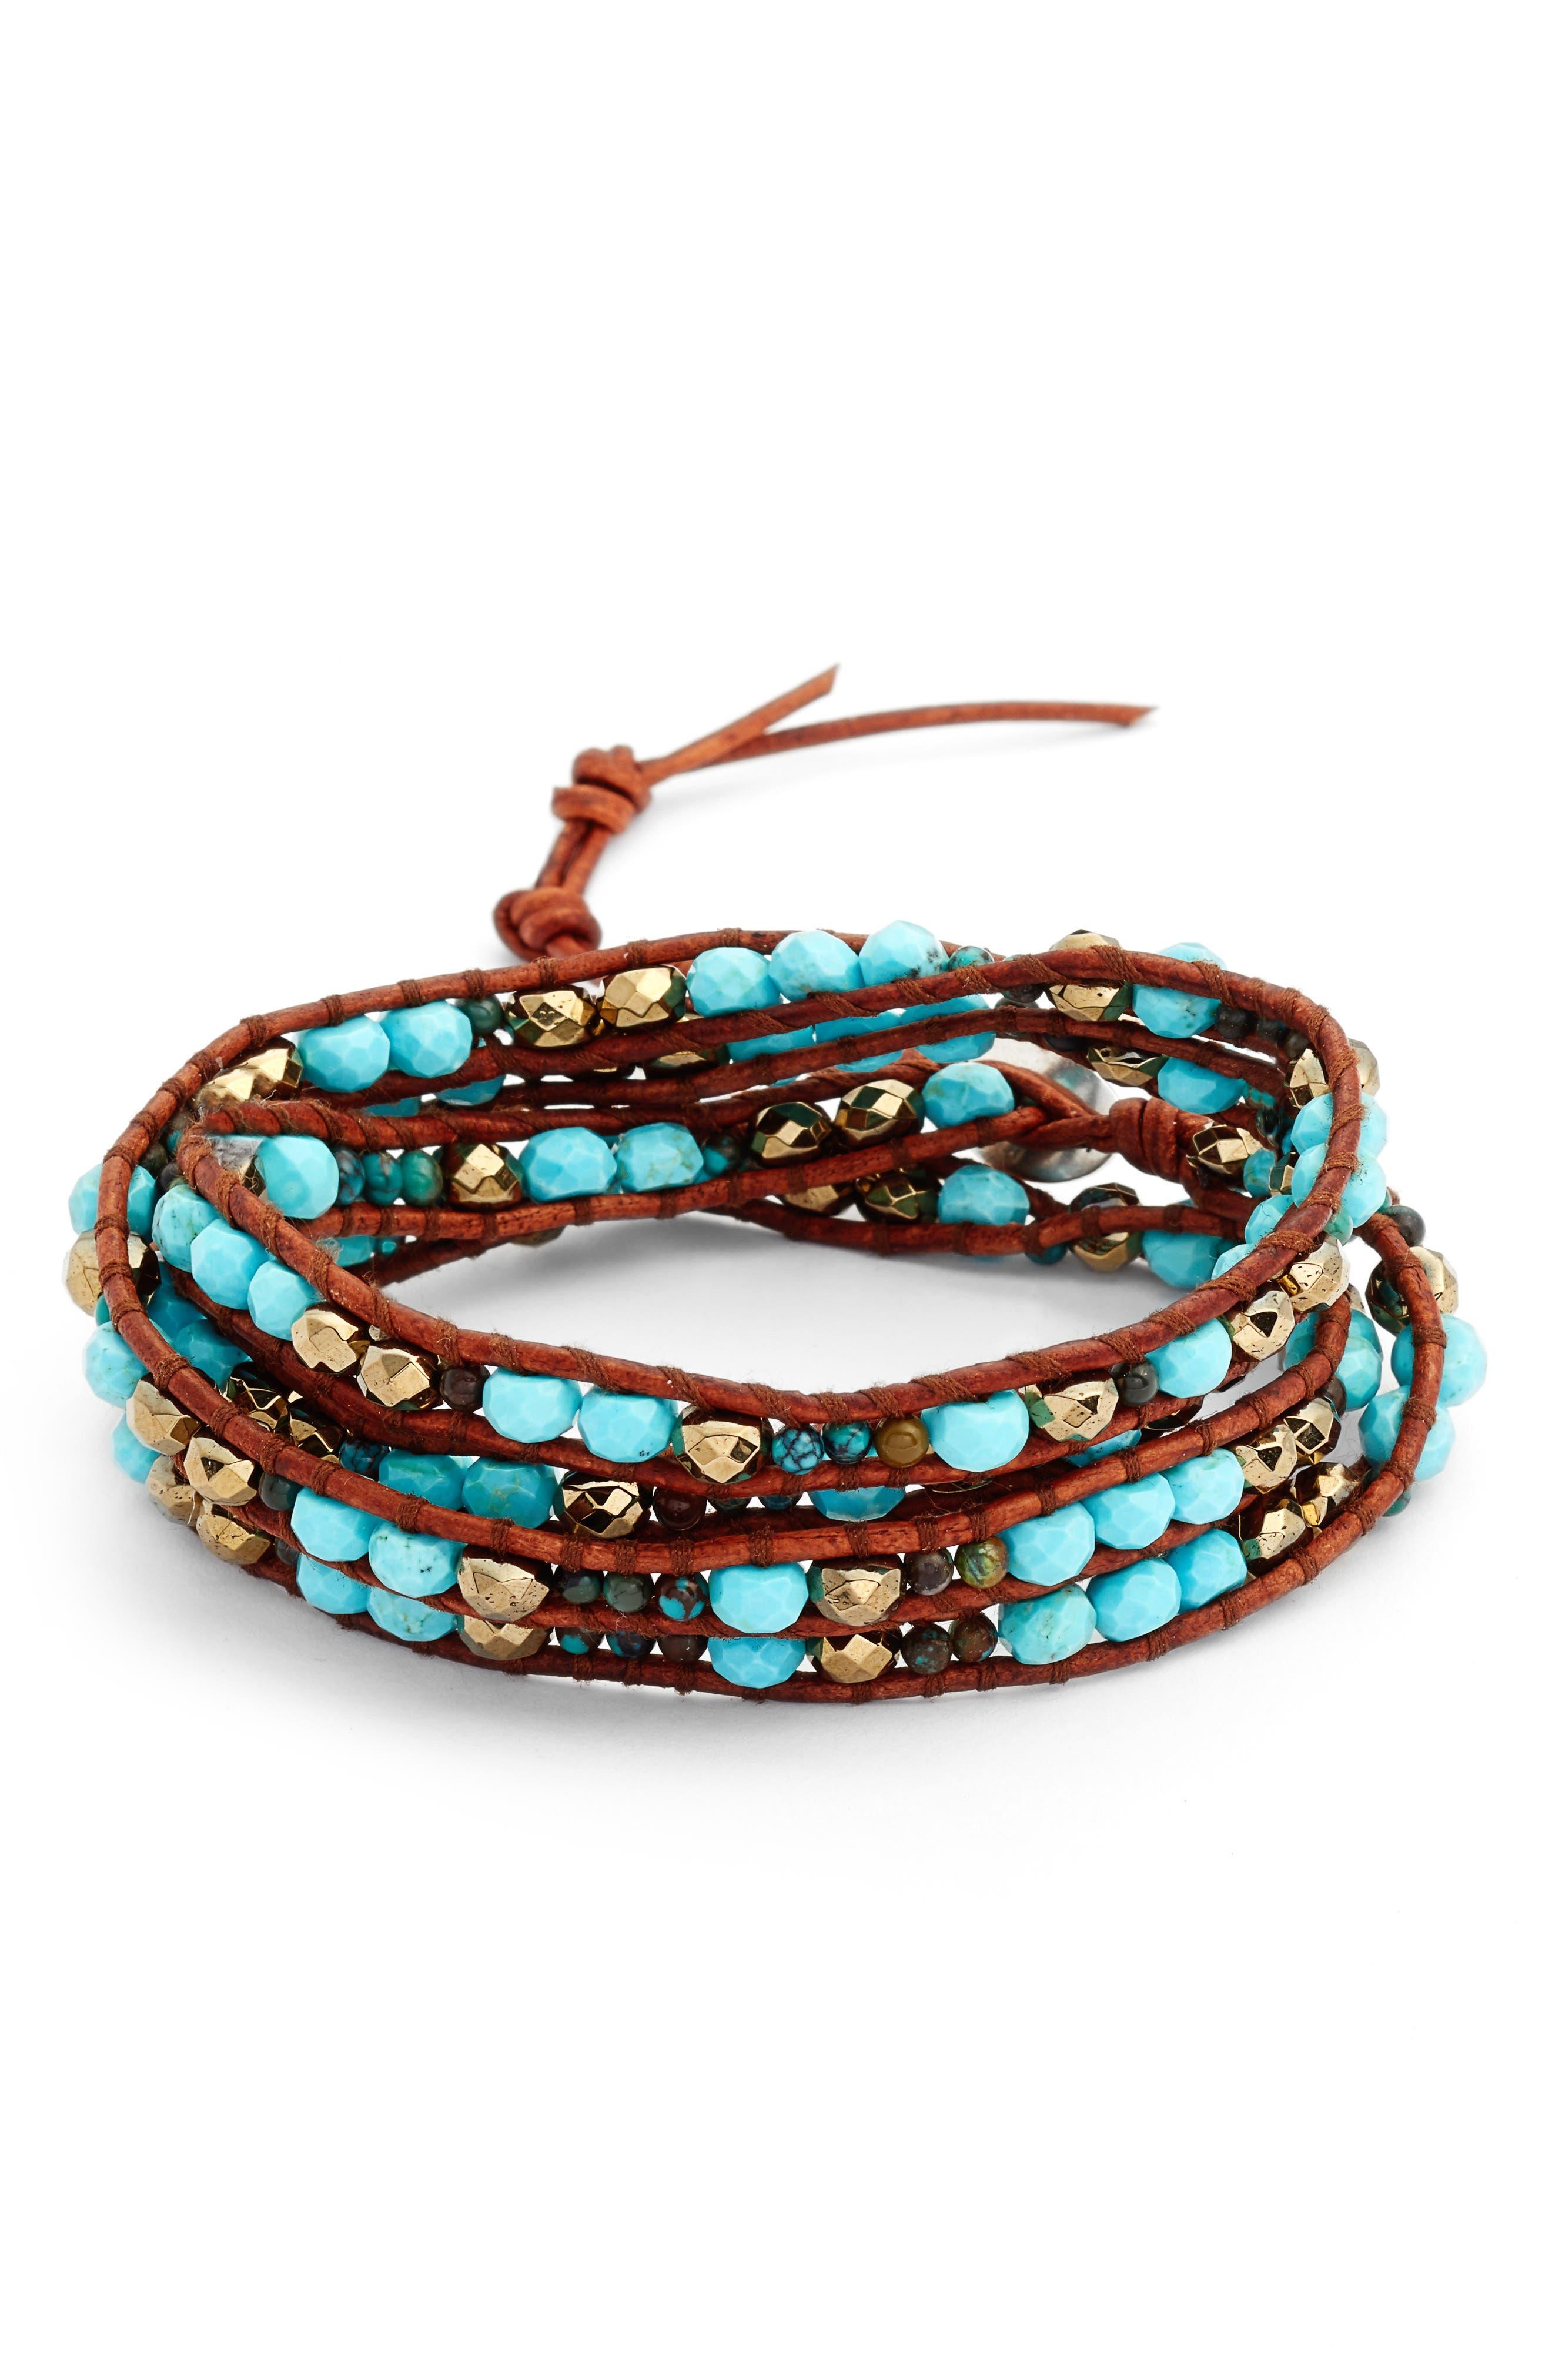 Mixed Semiprecious Stone Wrap Bracelet,                         Main,                         color, Turquoise Mix